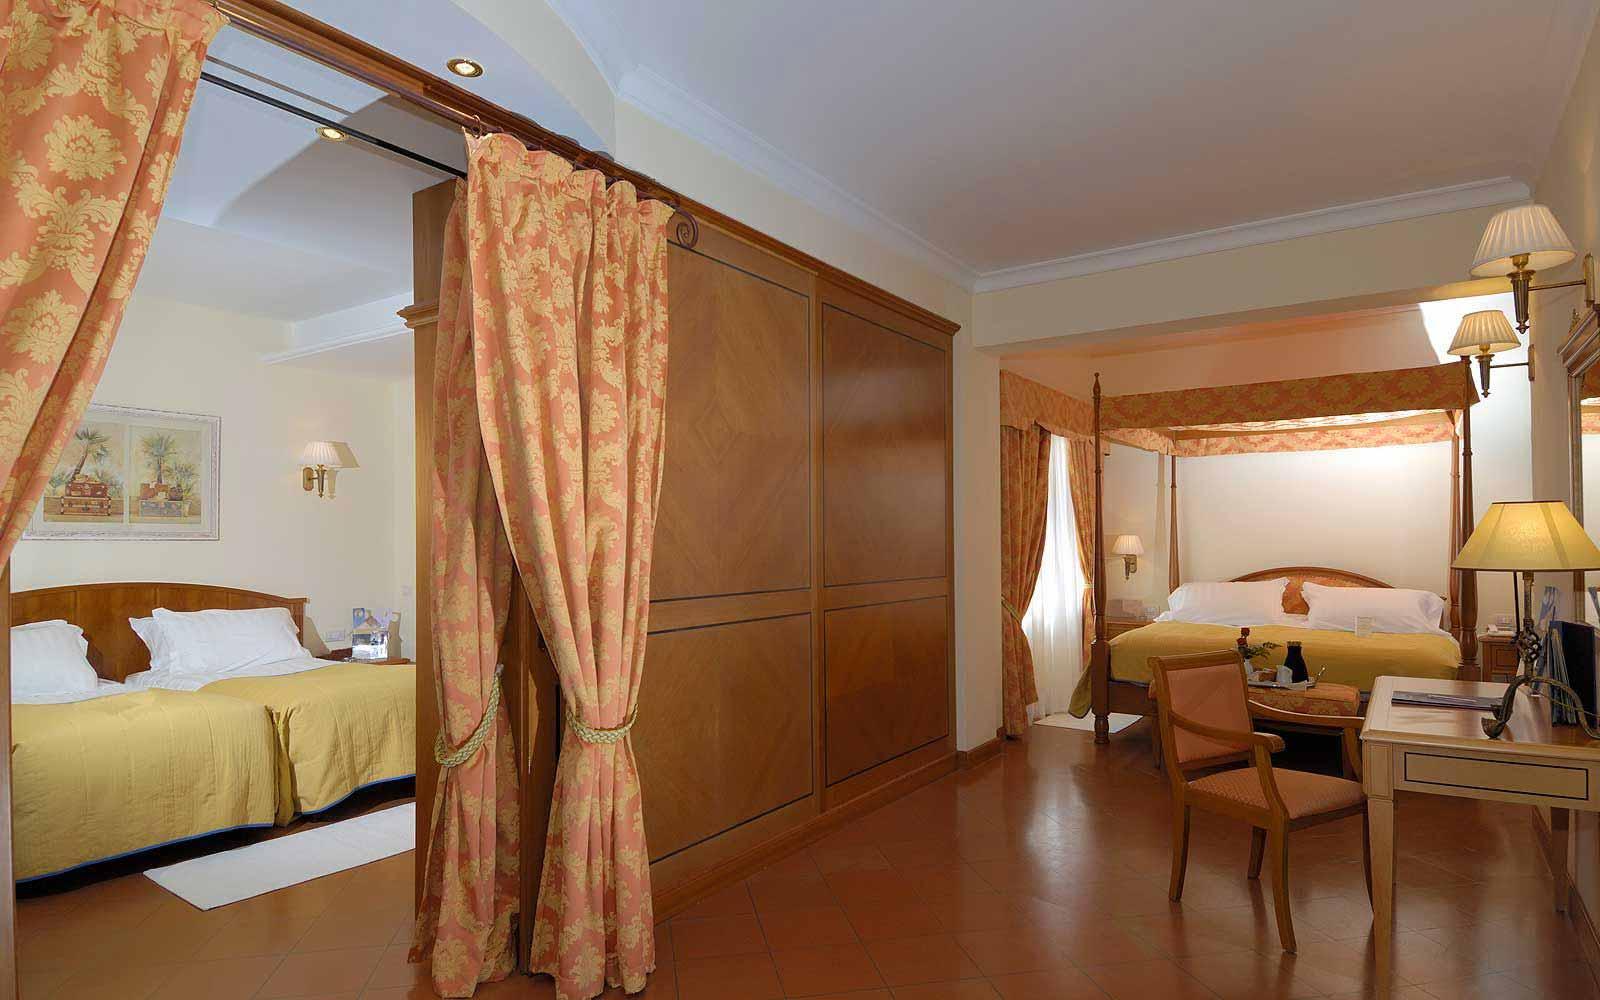 Baldacchino Suite at Pullman Timi Ama Sardegna